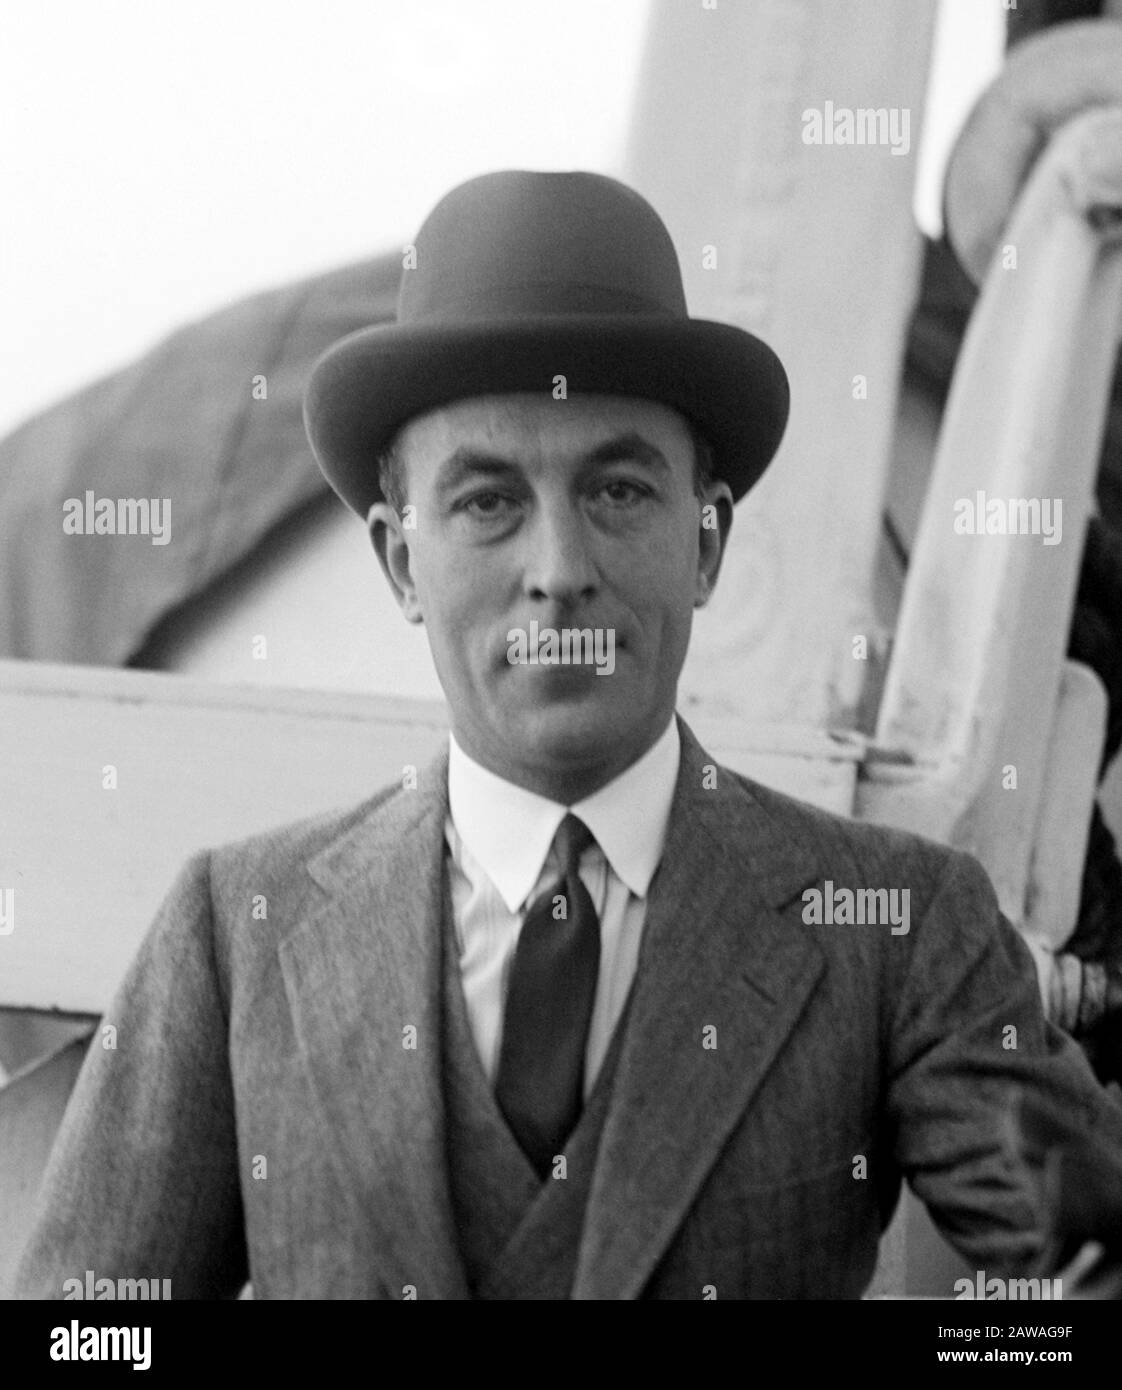 1924 25 October New York Usa The Most Celebrated French Fashion Designer Jean Patou 1887 1936 Arrive On Transatlantic In Usa Transa Stock Photo Alamy